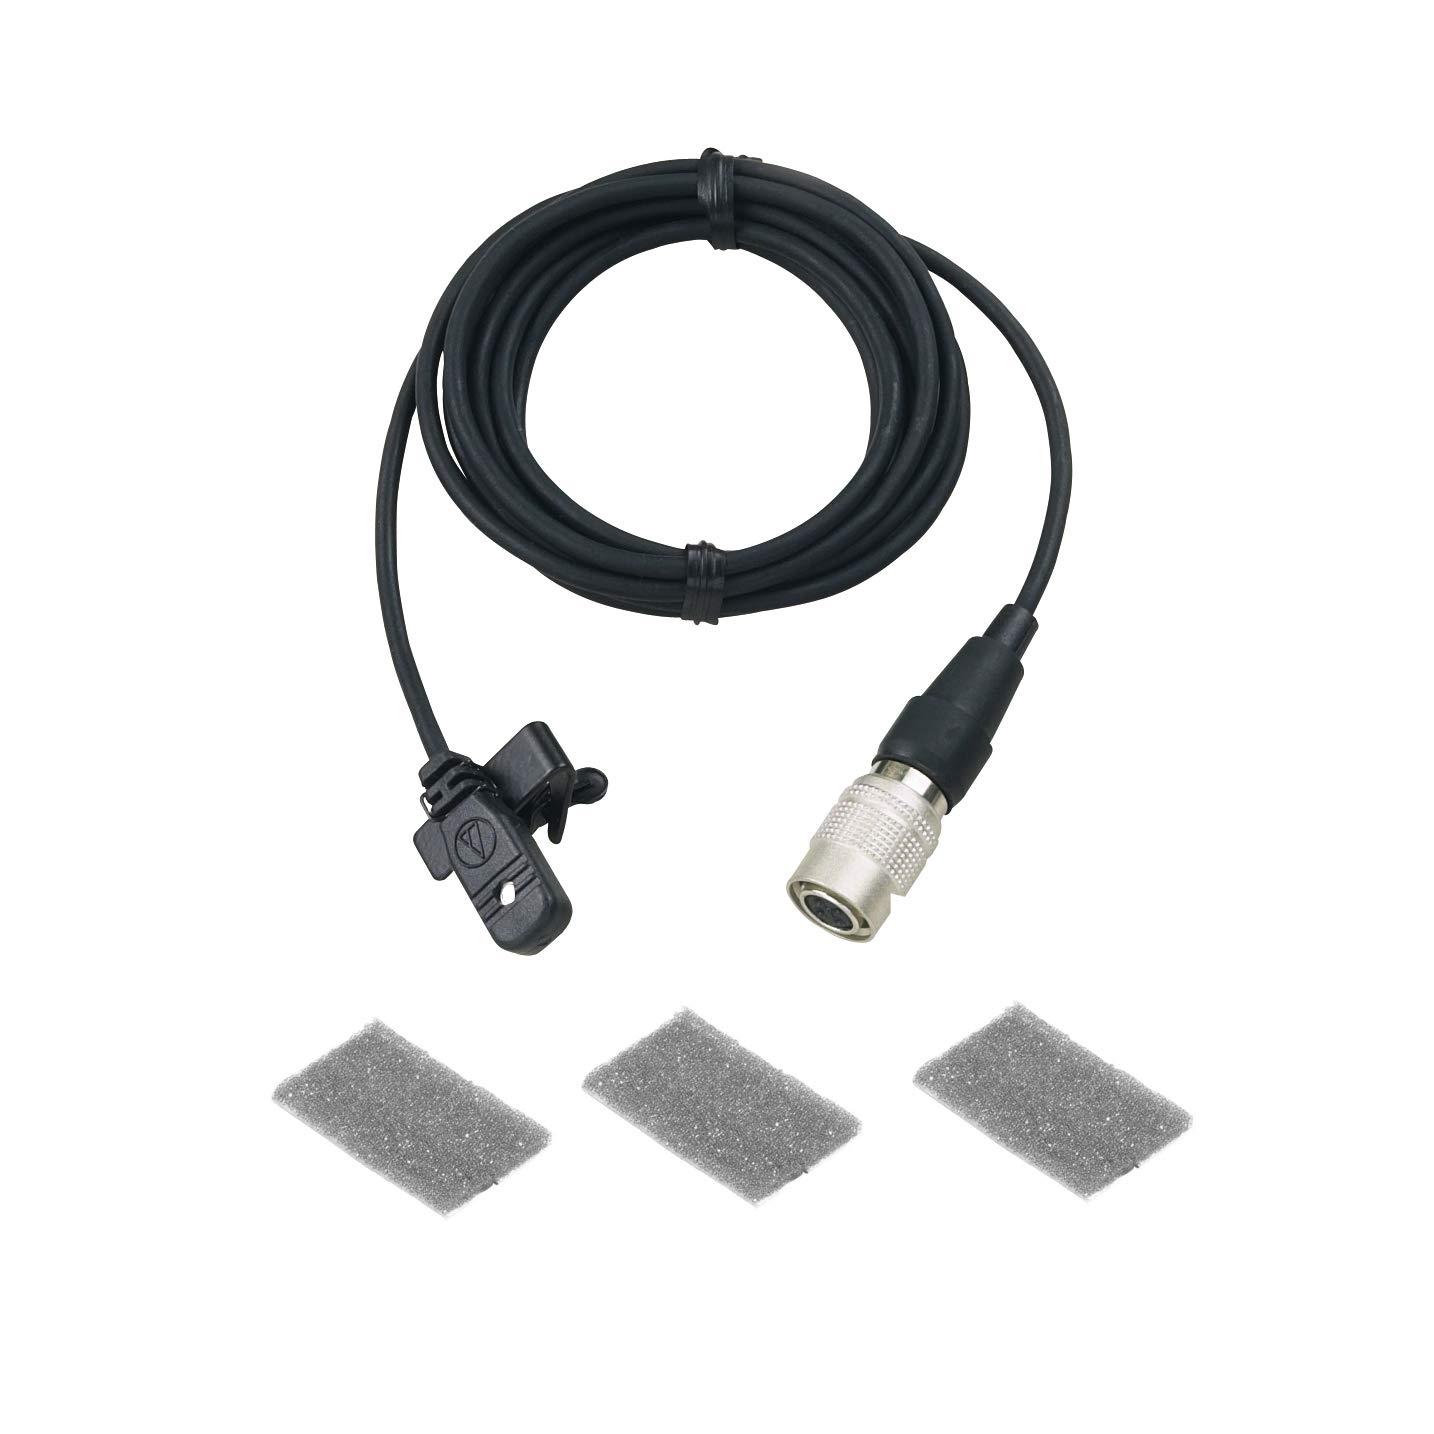 Audio-Technica MT830cW Omnidirectional Condenser Lavalier Microphone